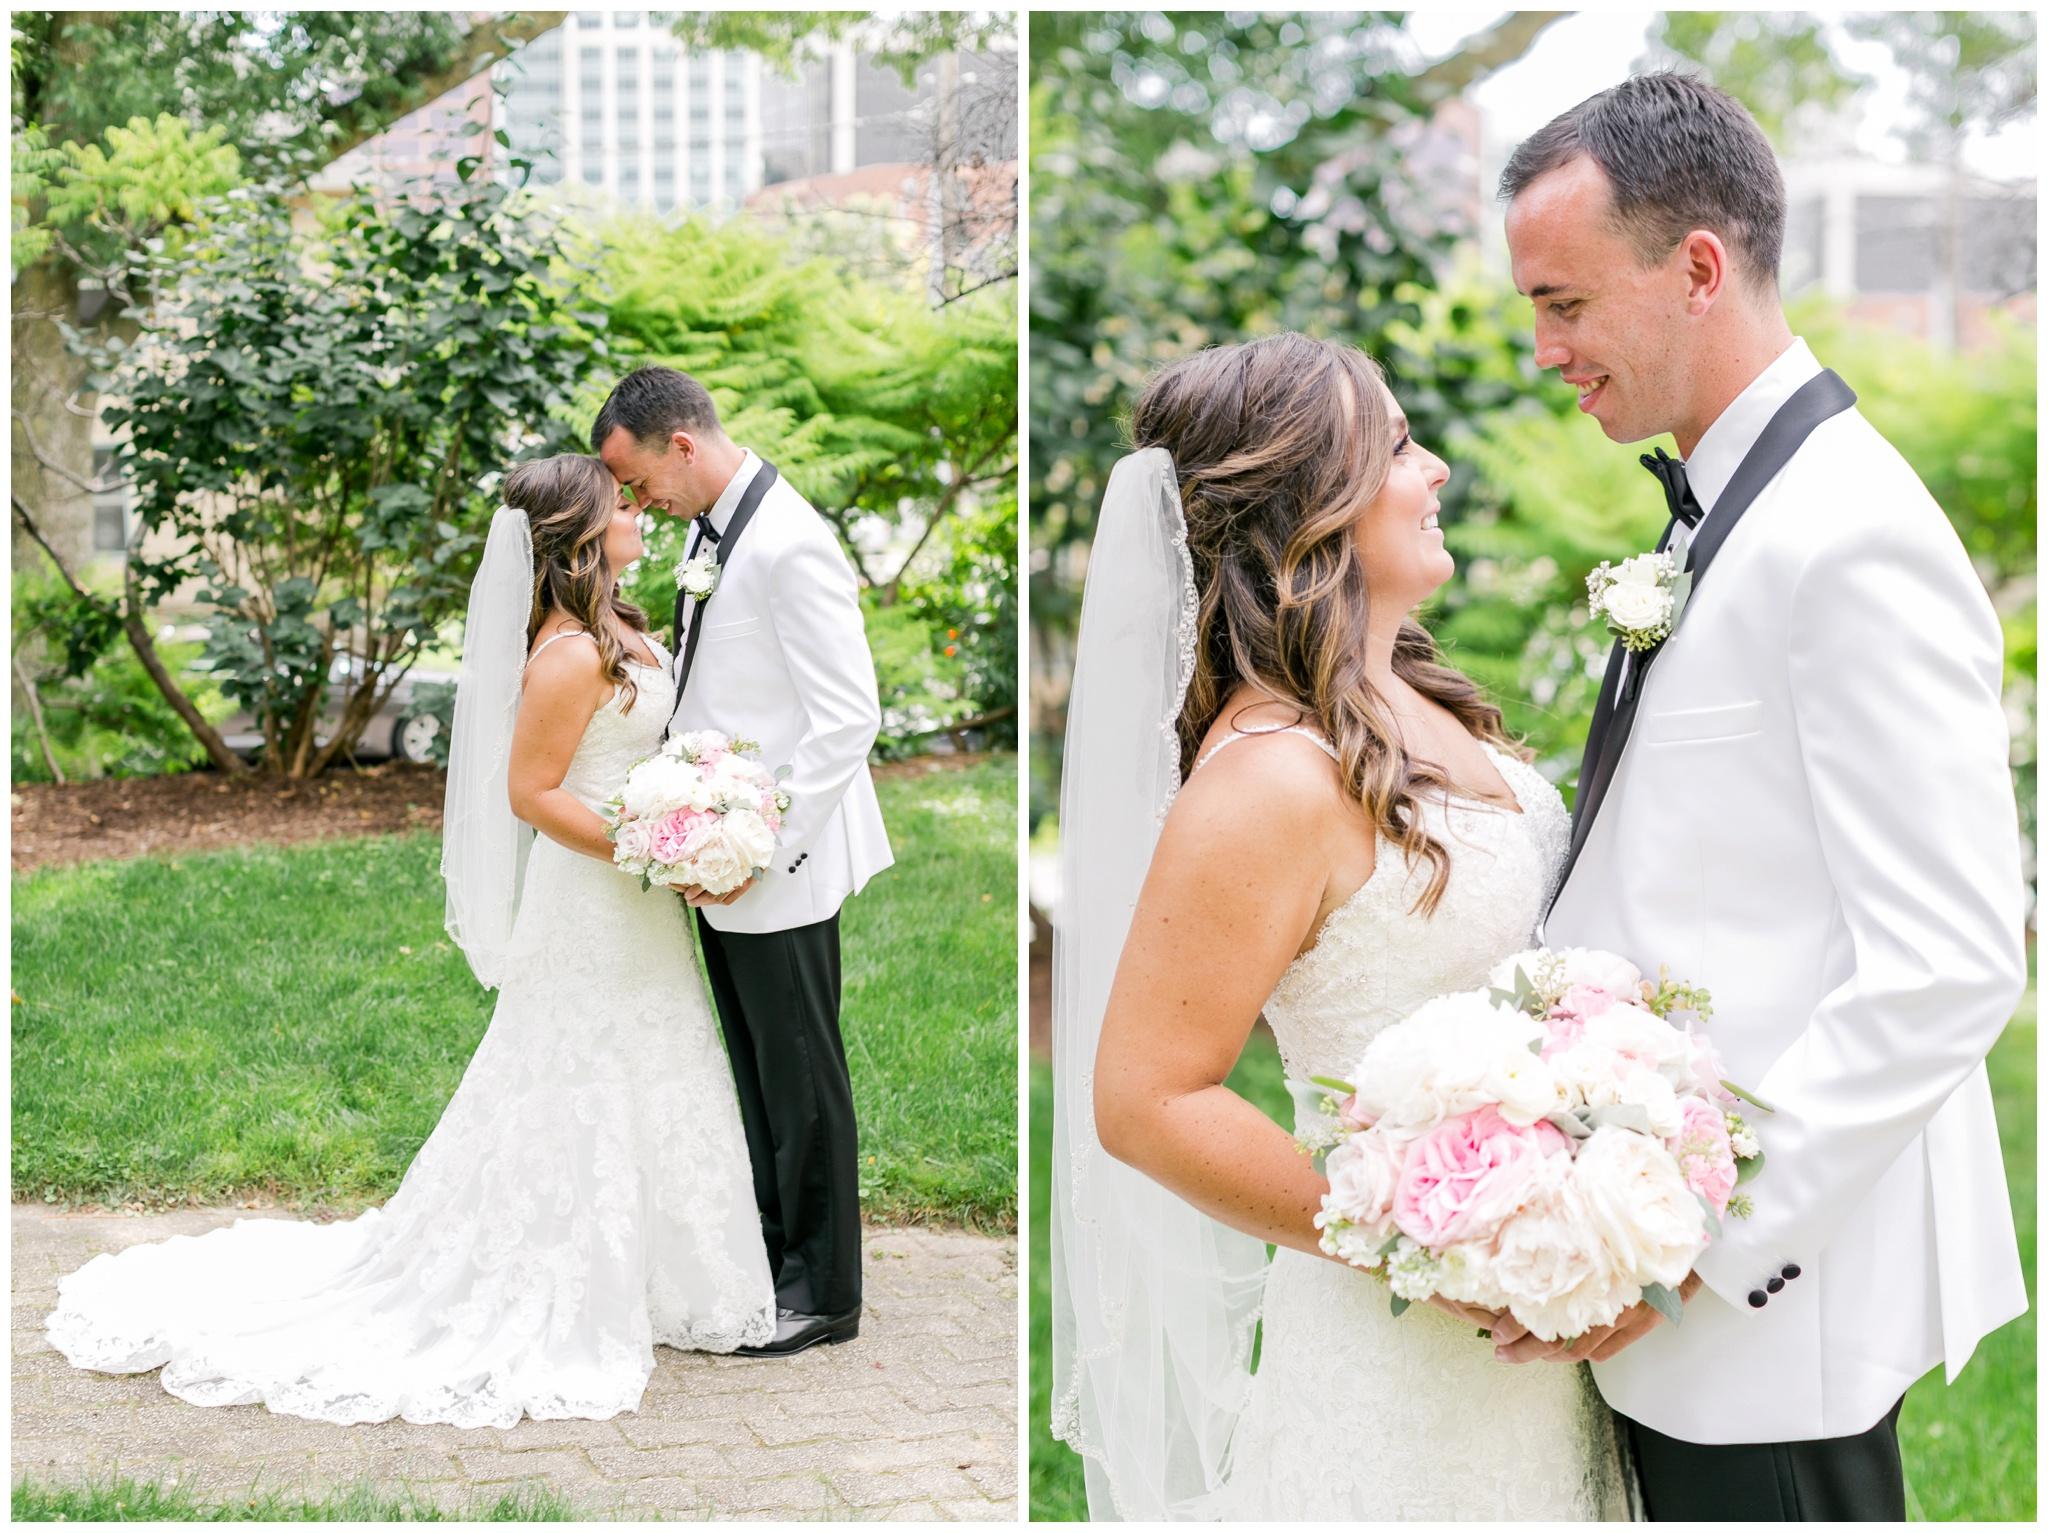 UW_Memorial_Union_wedding_madison_wisconsin_wedding_photographers_4597.jpg